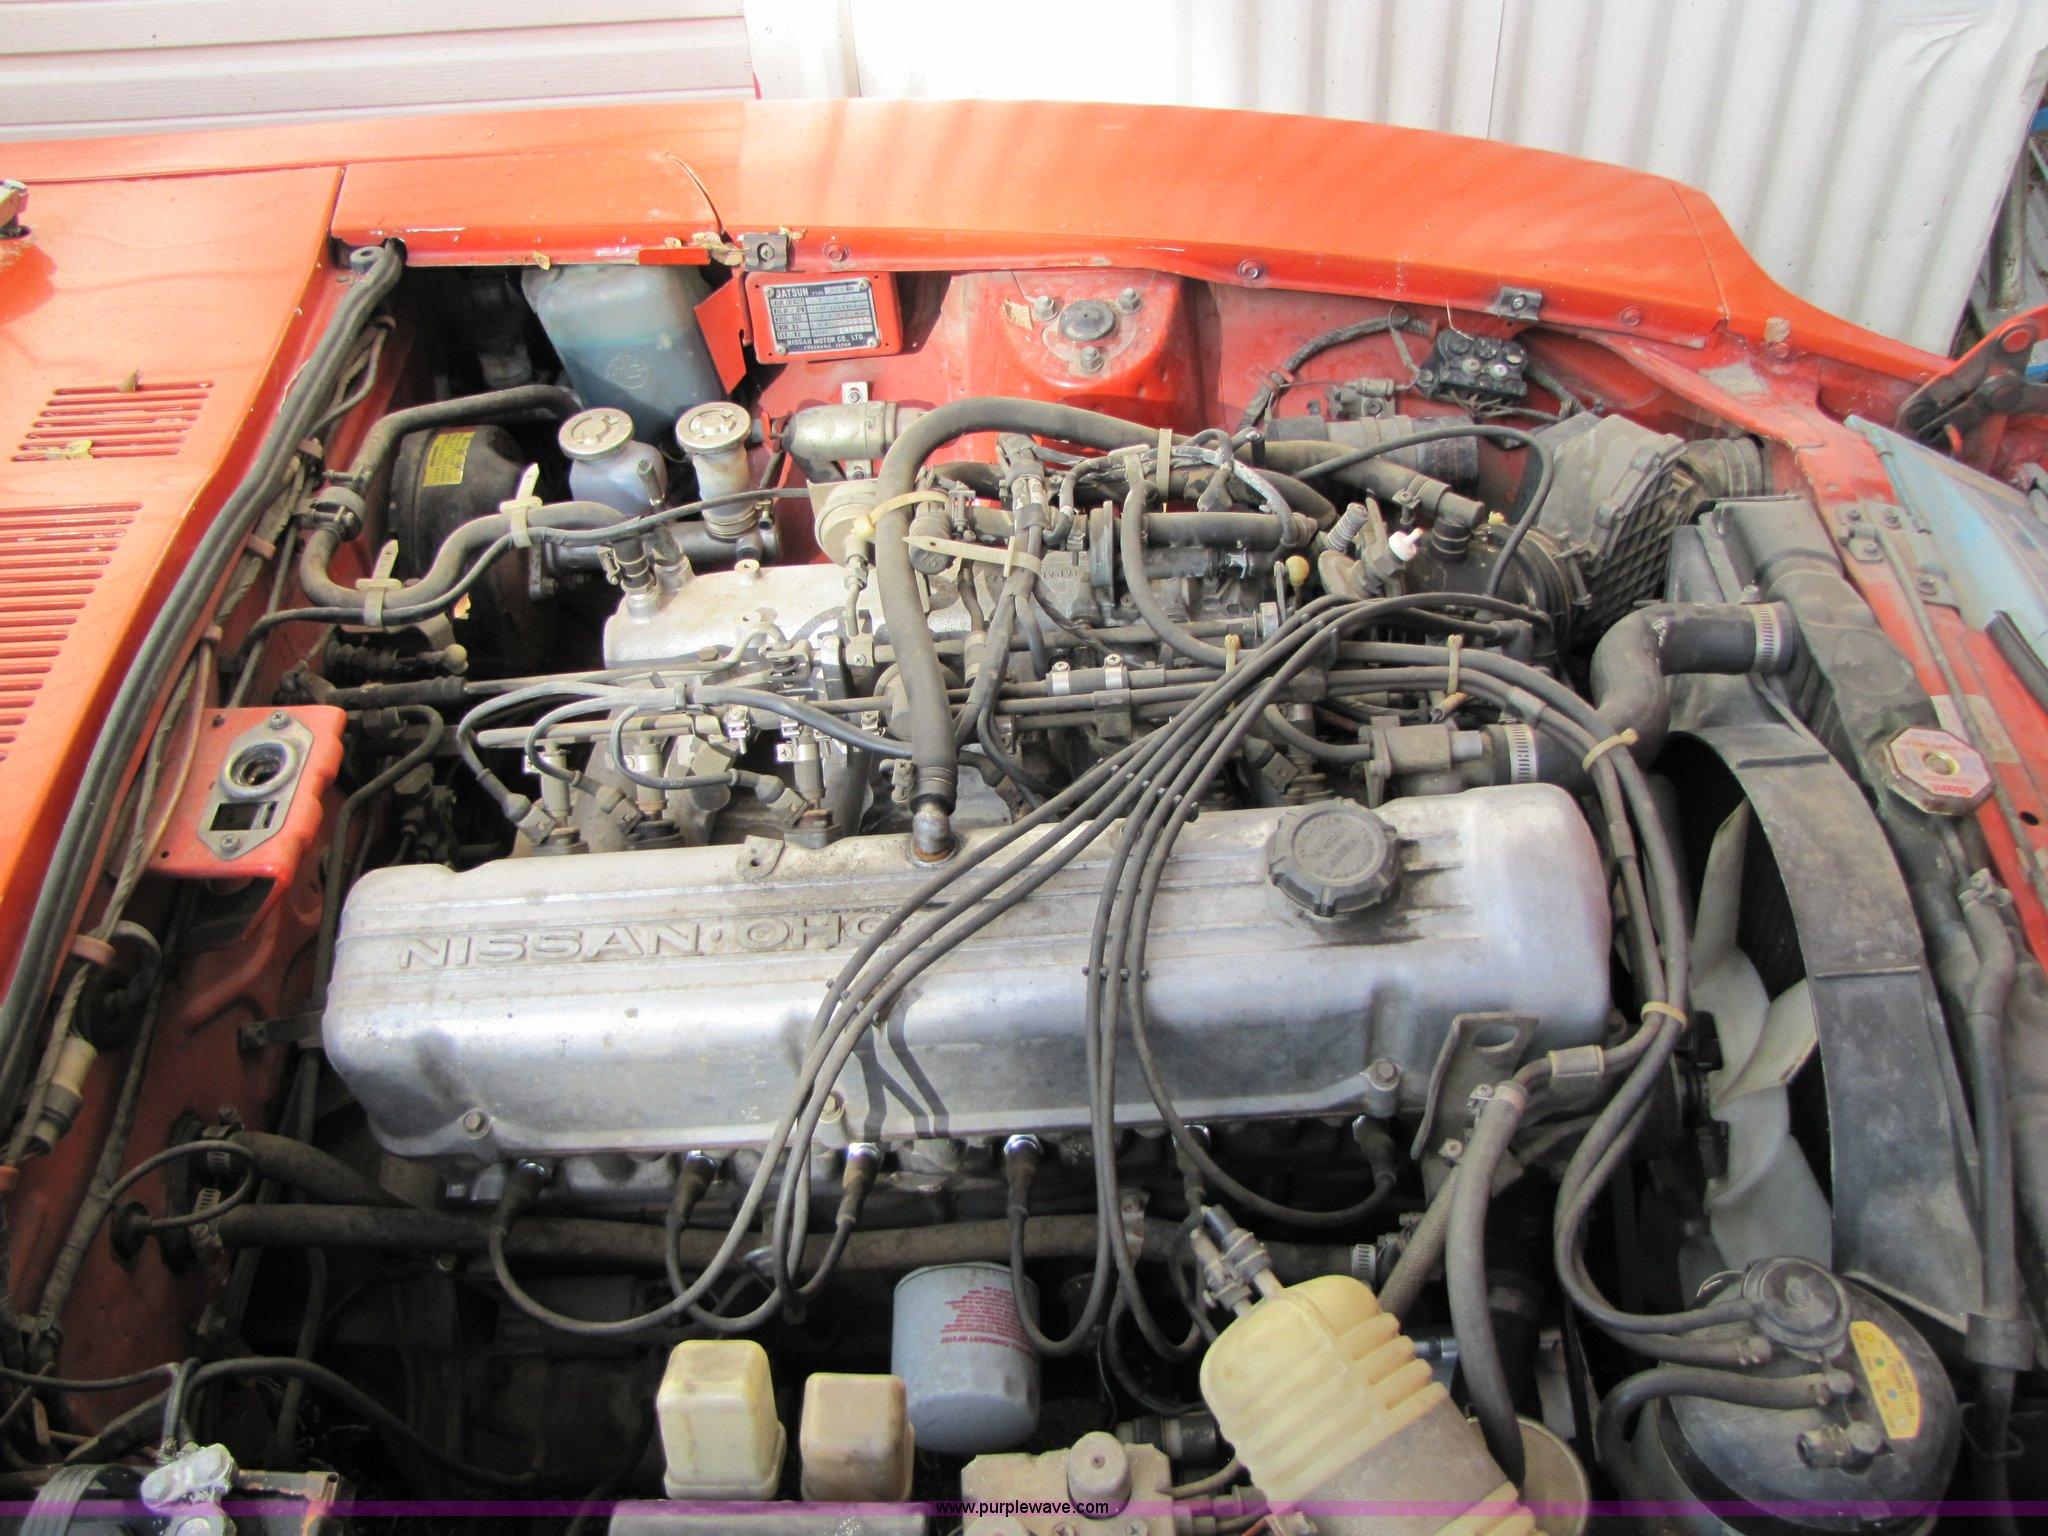 2017 06 1976 datsun 280z engine block for sale -  1976 Datsun 280z Two Door Coupe Full Size In New Window